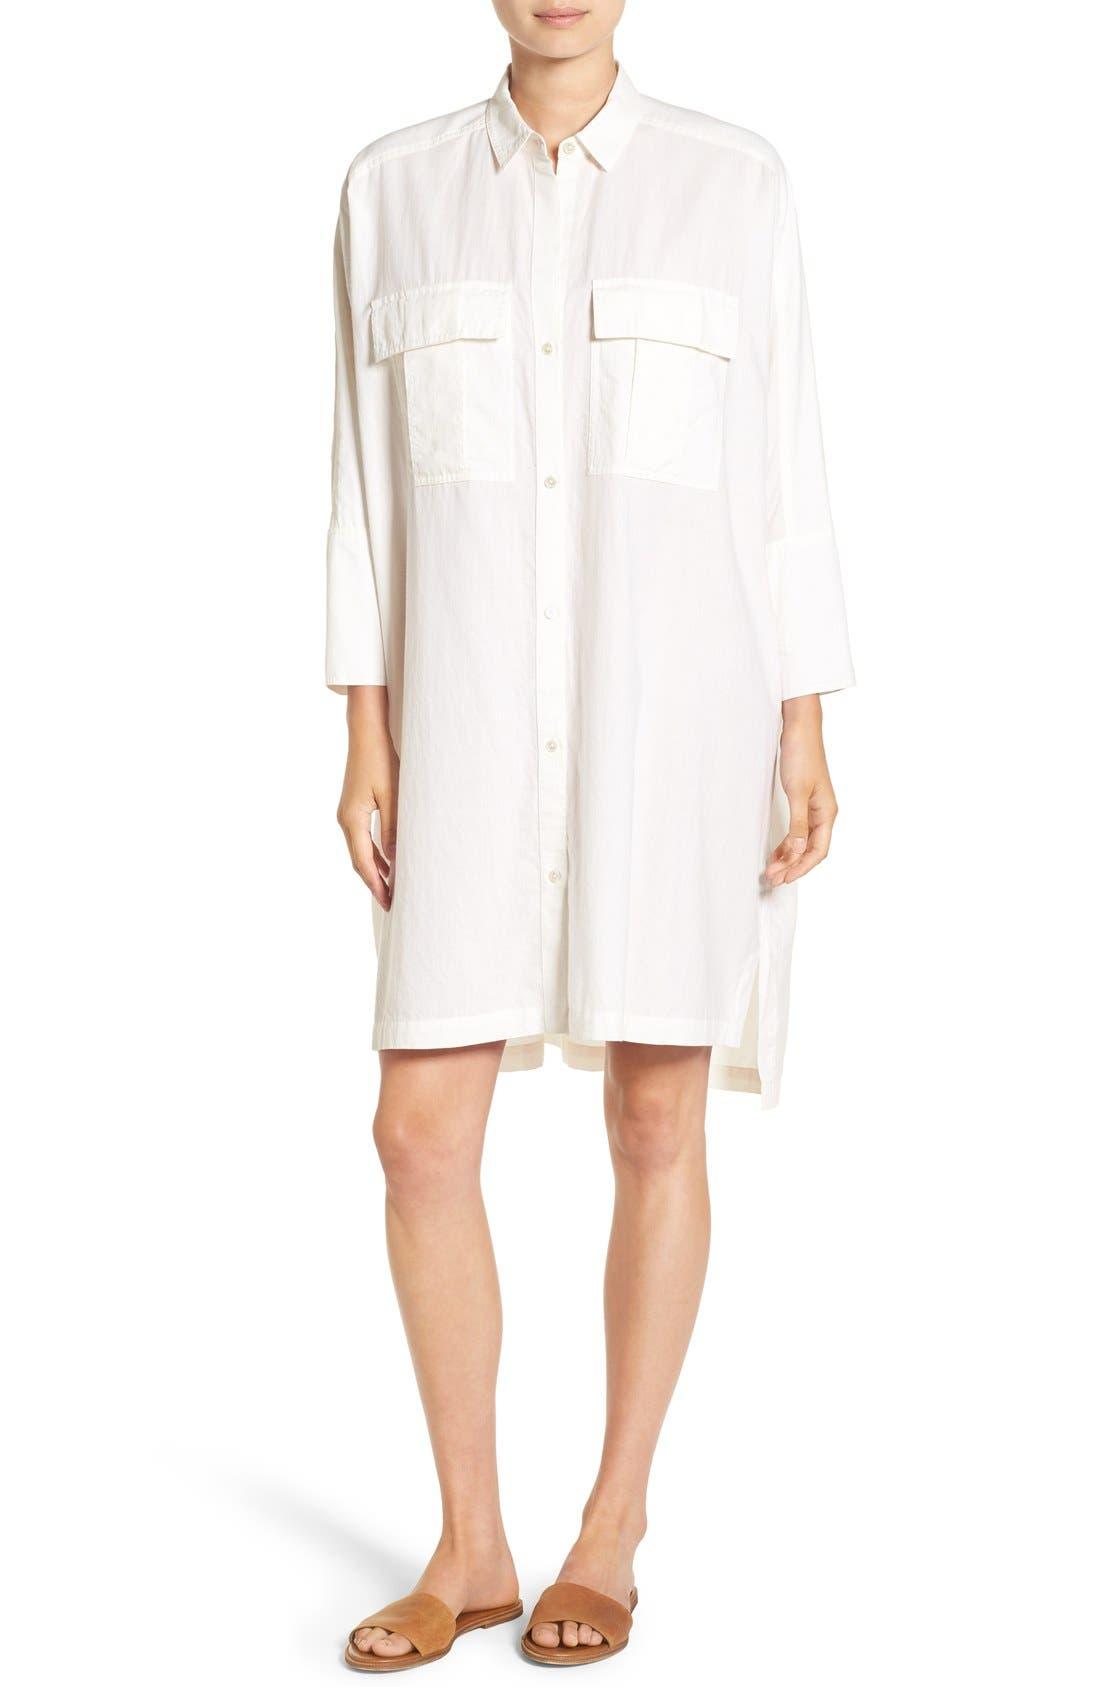 Alternate Image 1 Selected - James Perse Cotton Shirtdress